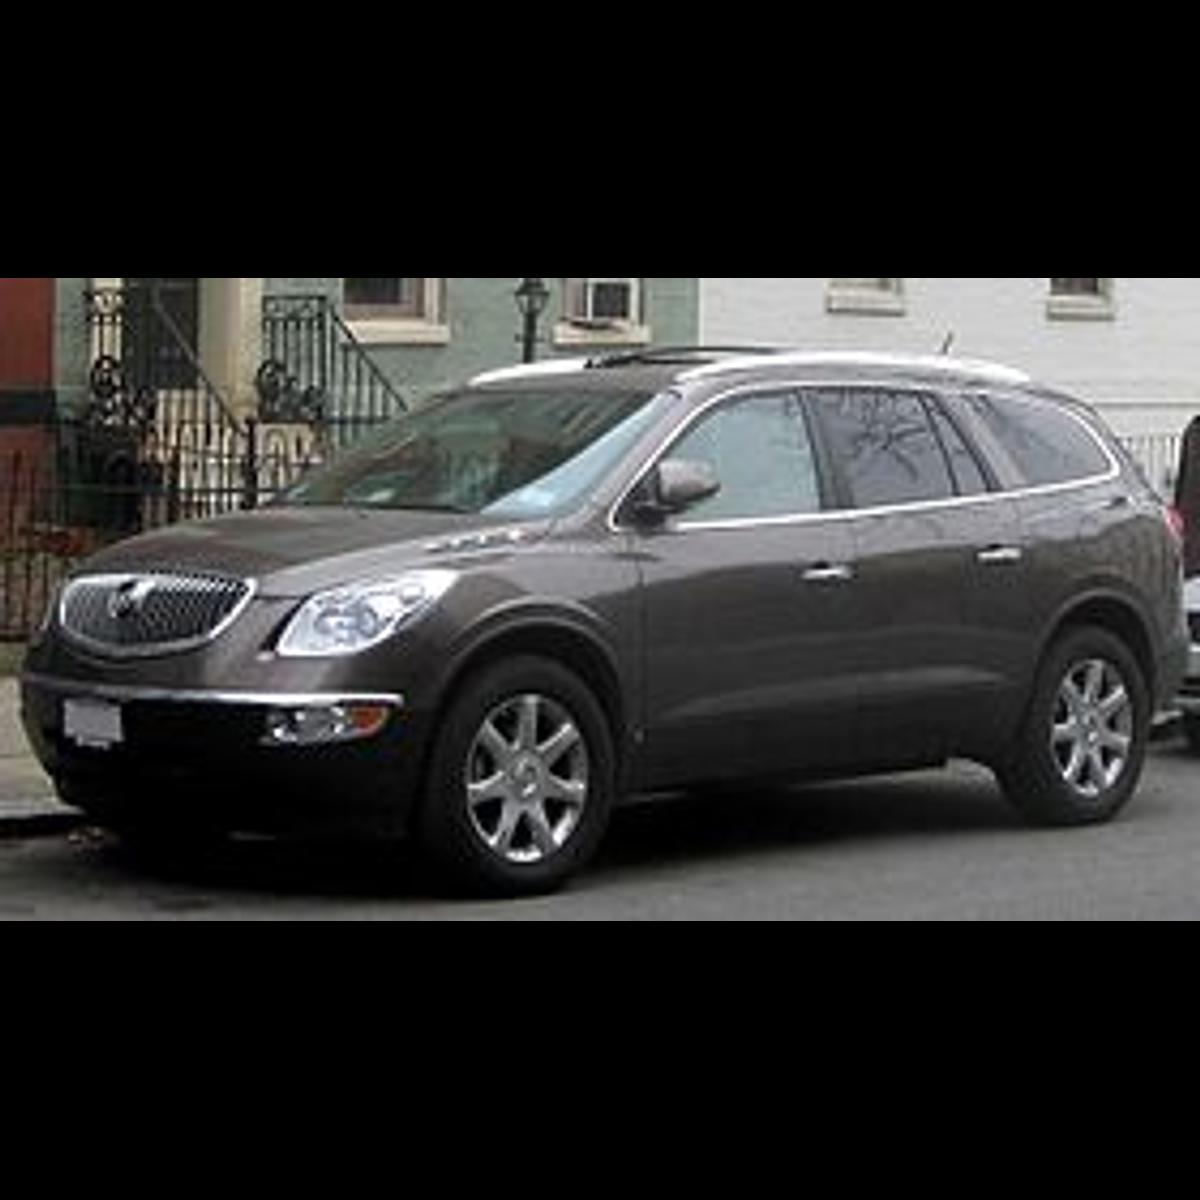 Manual De Taller Buick Enclave (2008-2017) Español